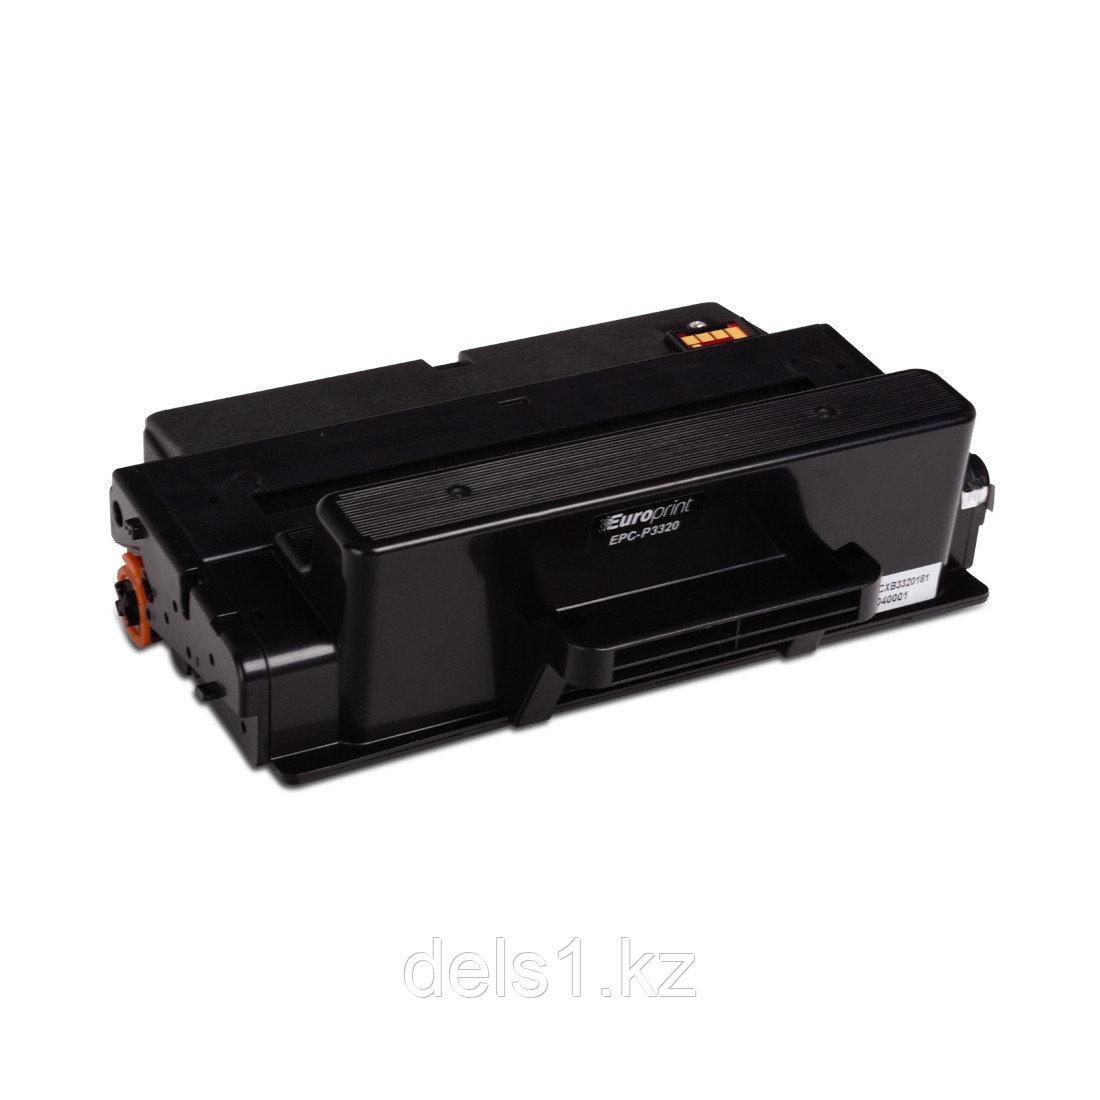 Картридж, Europrint, EPC-WC3320, Для принтеров Xerox Phaser 3320MFP, 5000 страниц.